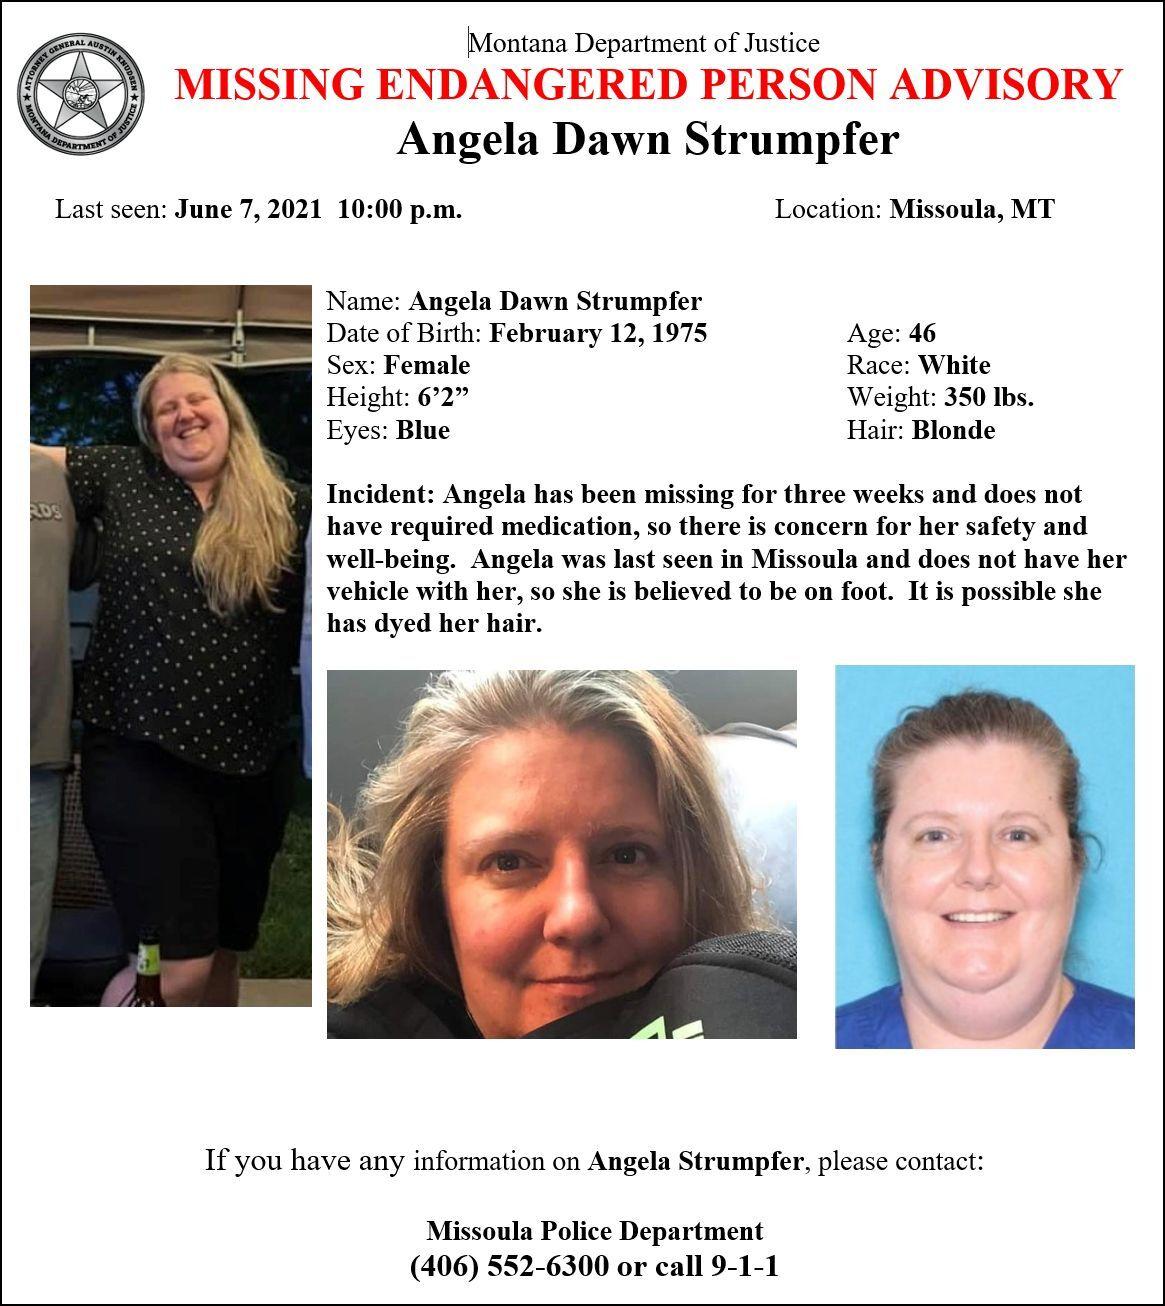 Missing-Endangered Person Advisory for 46-year-old Angela Dawn Strumper of Missoula